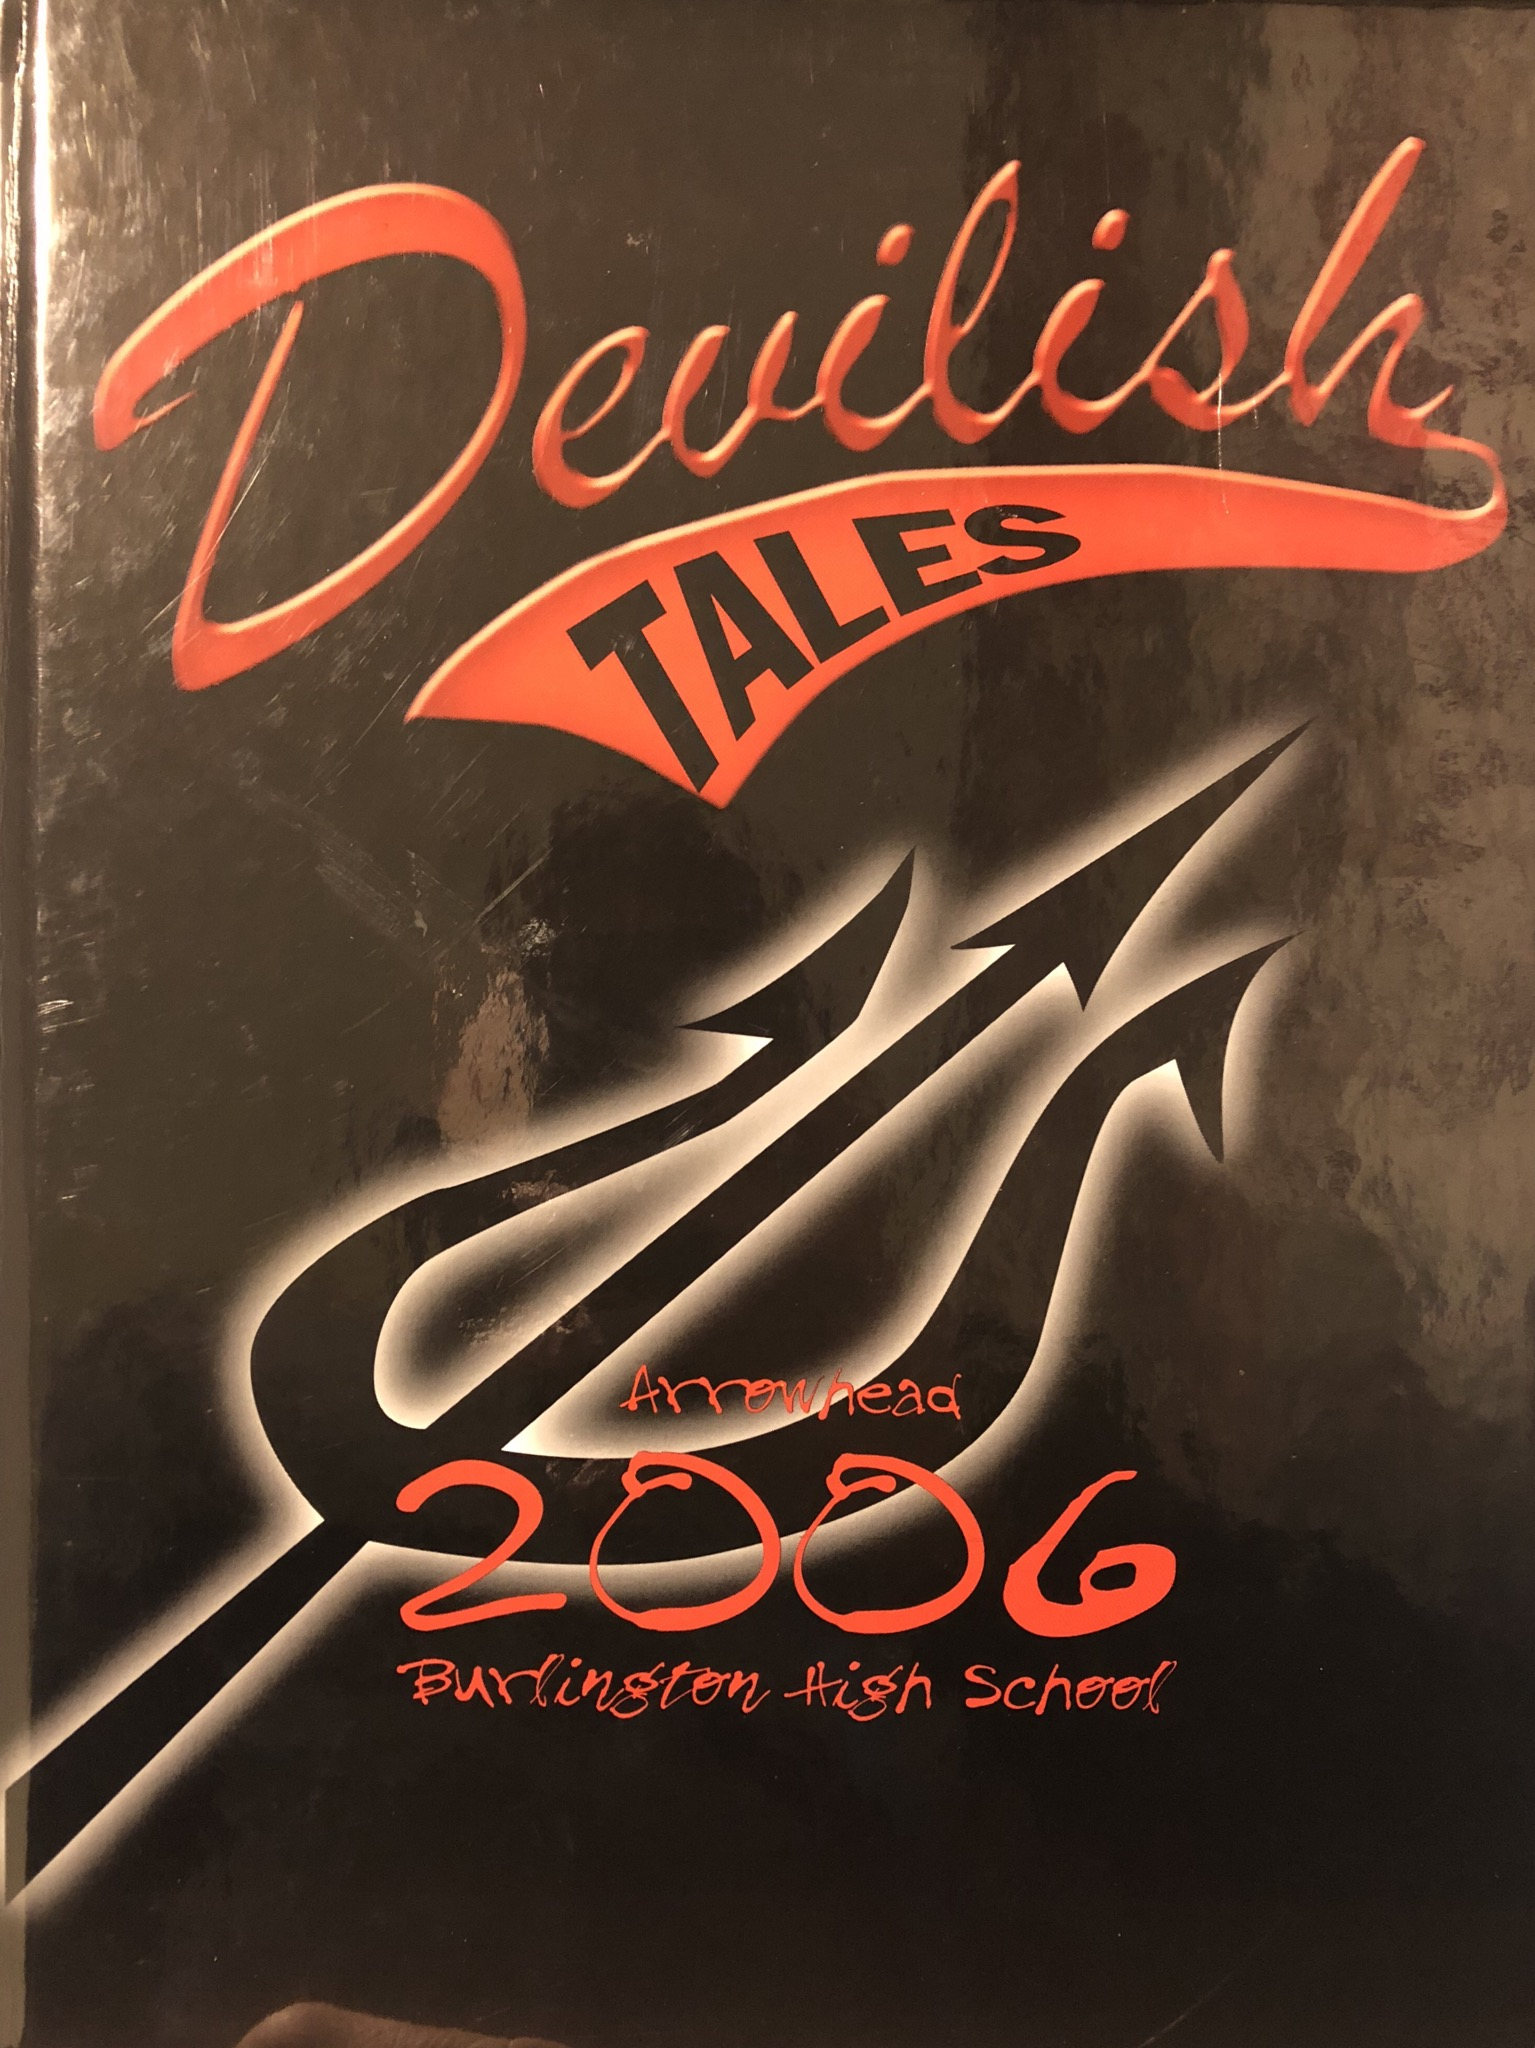 Class of 2006 Burlington MA High School yearbook cover